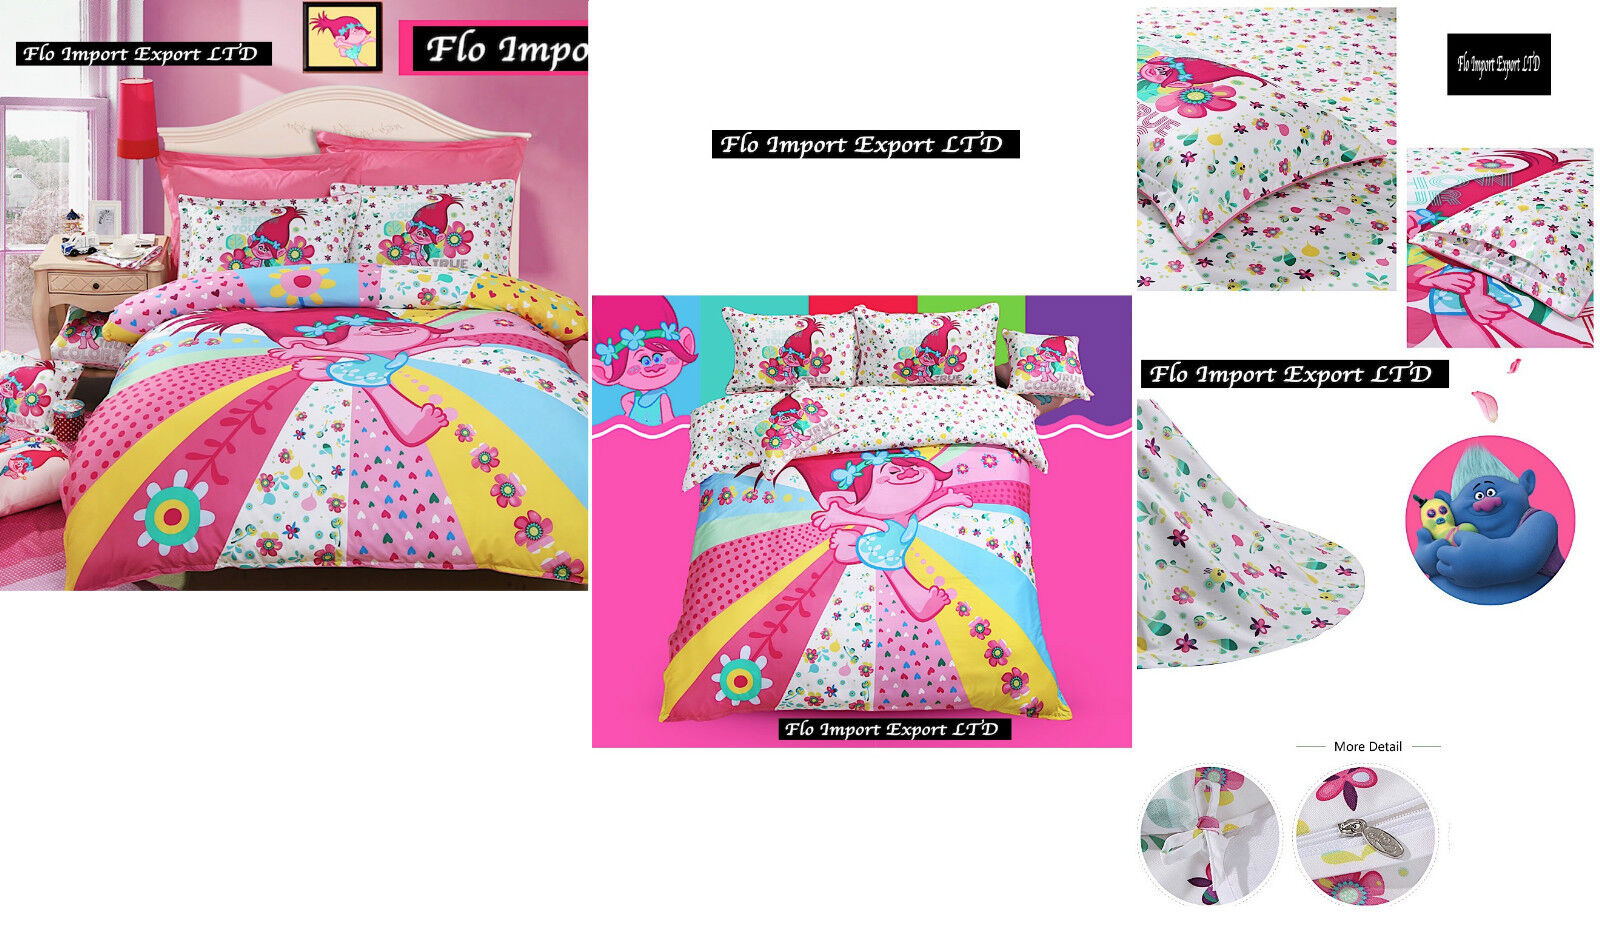 Copripiumino 250x260.Trolls Set Cover Duvet Duvet Sheets Pillowcases Duvet Cover Set